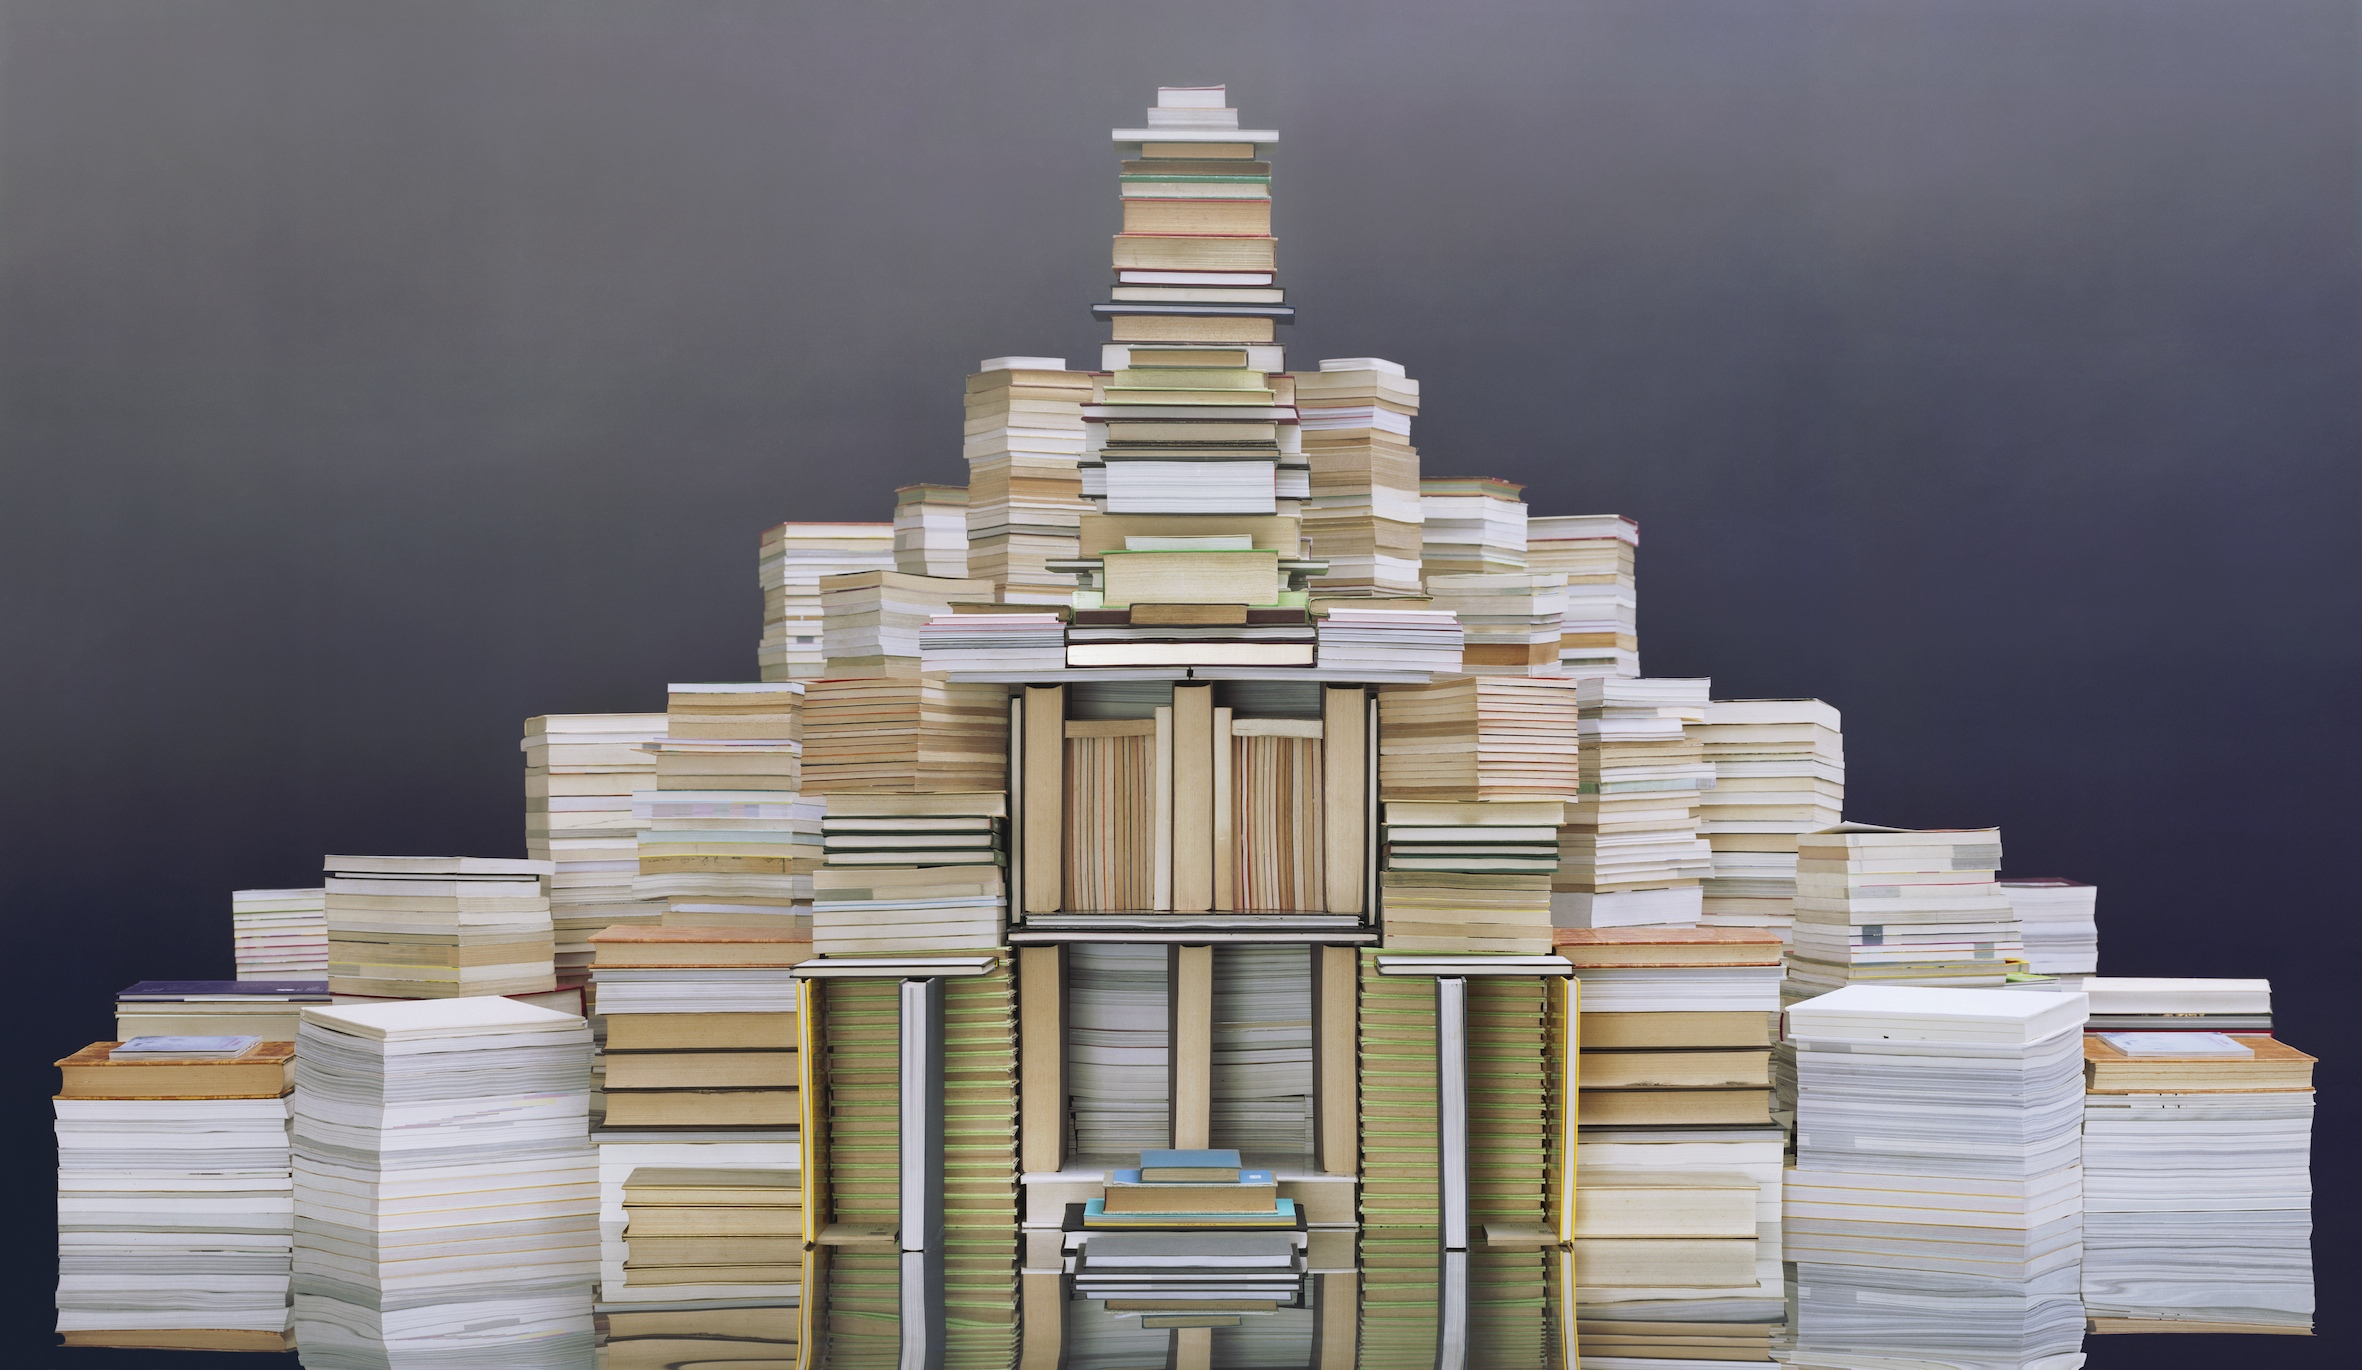 Ji Zhou 计洲, Maquette No.4 模型之四, 2014, Ultra Giclee 艺术微喷, 145 x 250 cm, Ed of 4